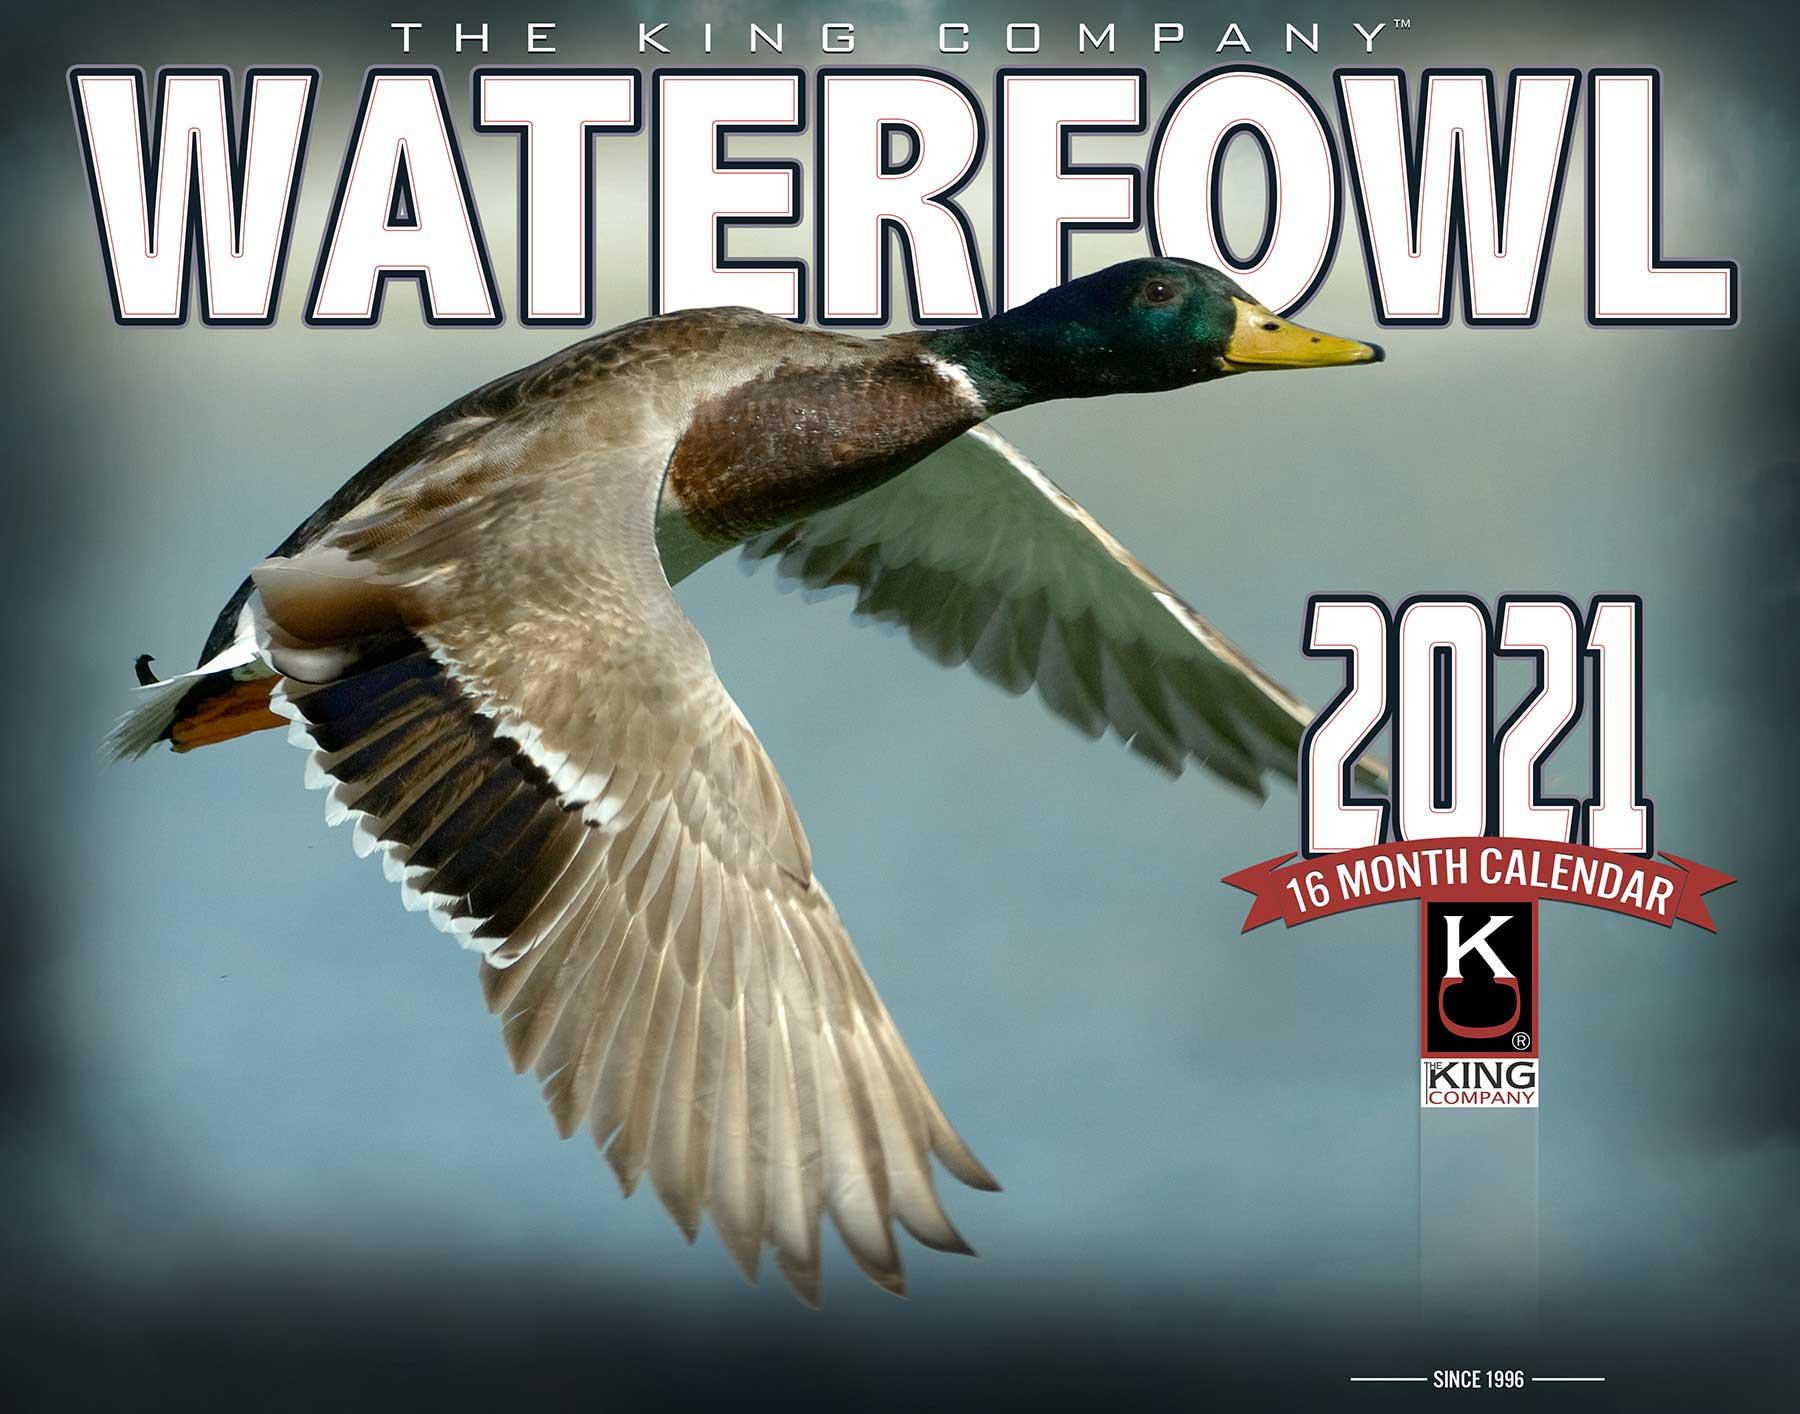 2021 Waterfowl Calendar - The King Company